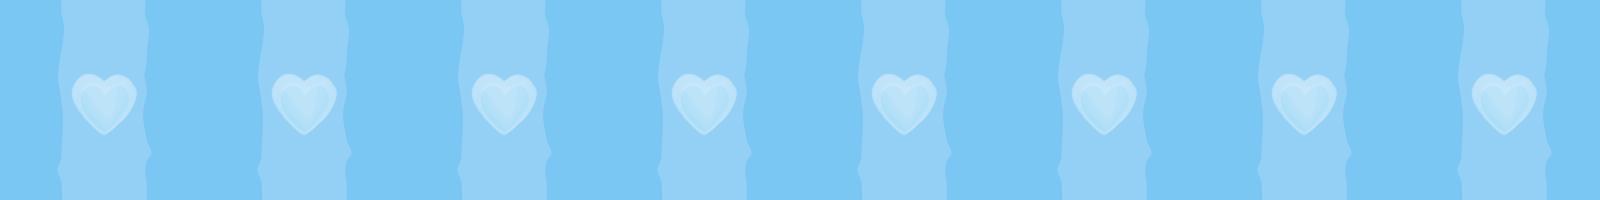 LoveLife_Banner.png